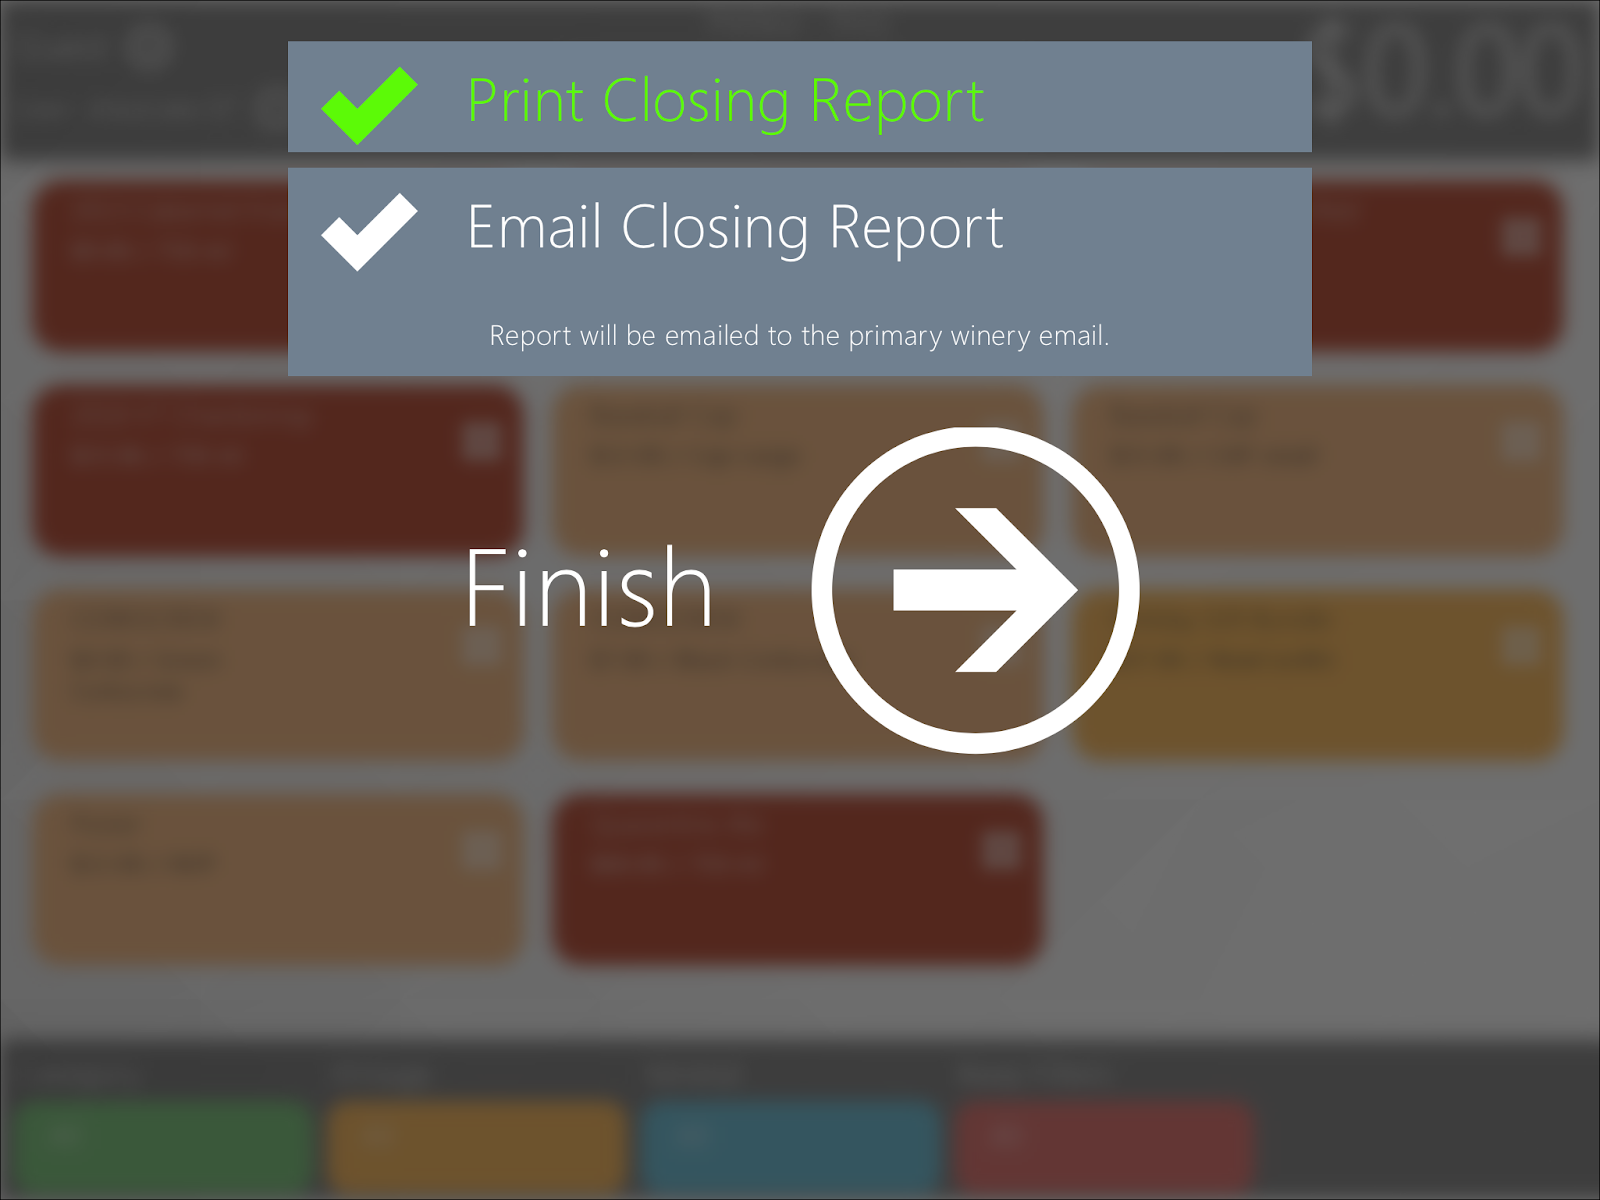 Print Closing Report Screen